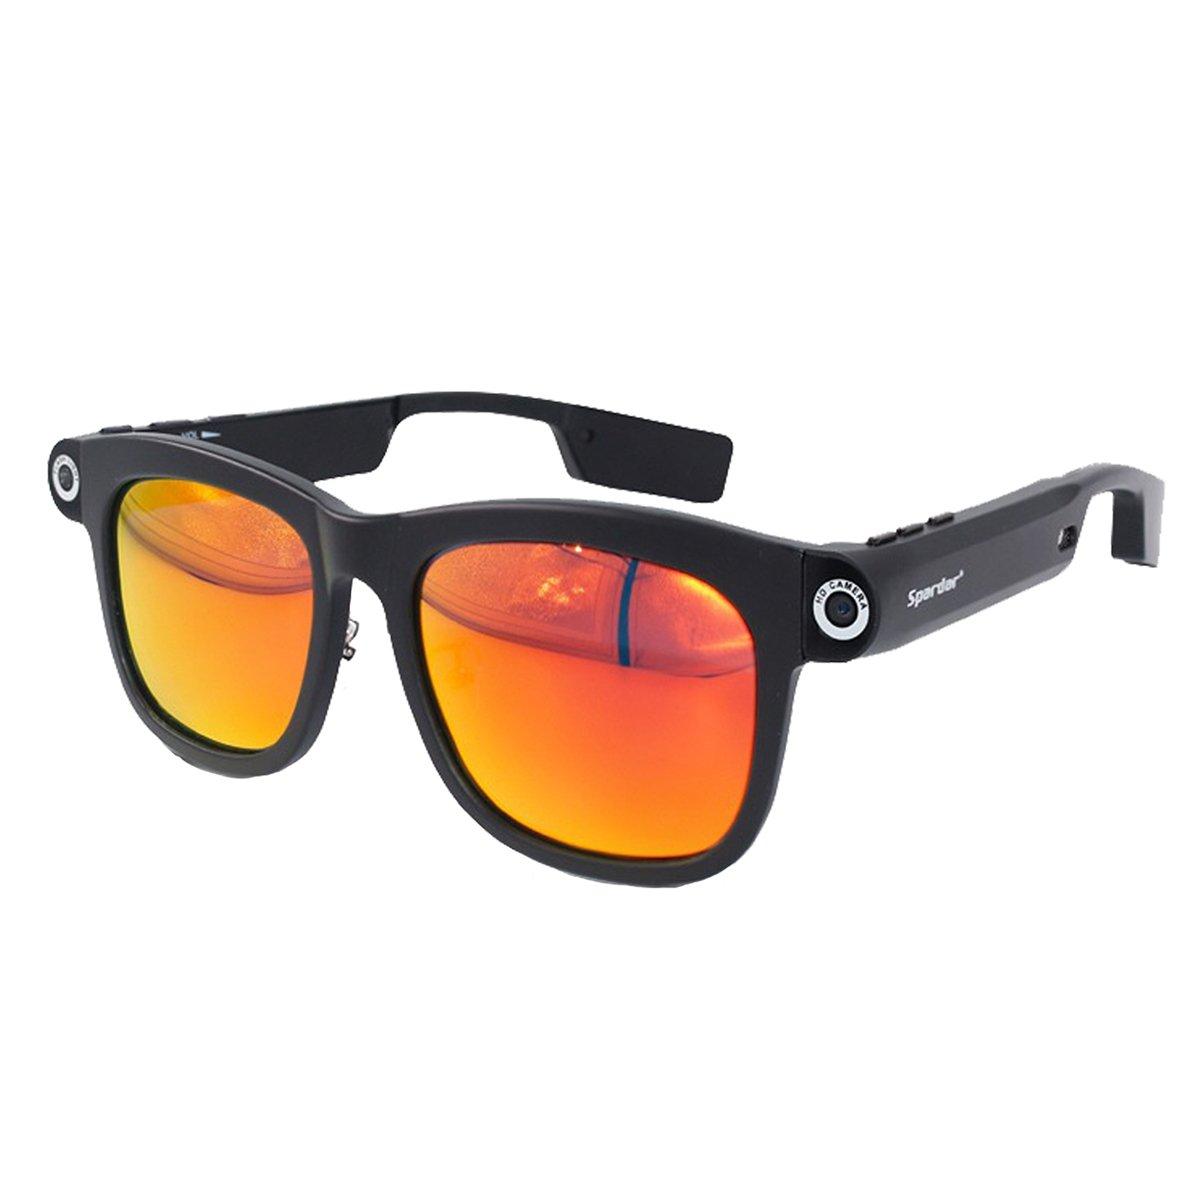 1280x720p CSR4.0 Bluetooth 8GB TFカード 内蔵 ビデオメガネネ サングラス UV400 偏光 サングラス (8G-Red Orange) B078NSJ65H 8G-Red Orange 8G-Red Orange